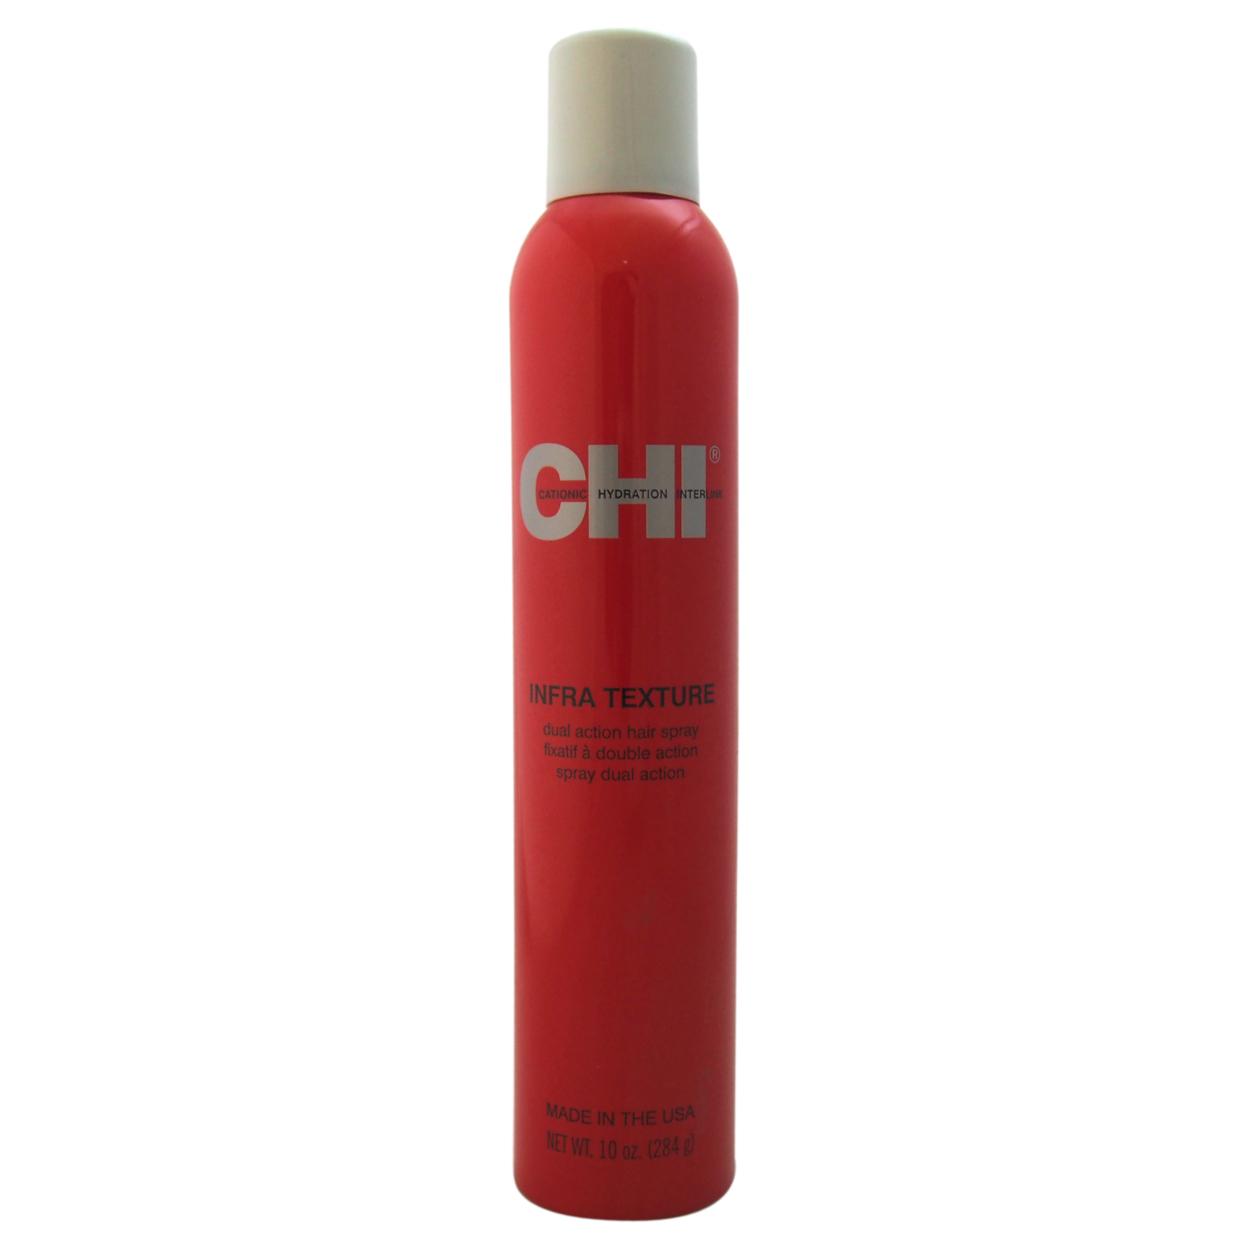 Infra Texture Hair Spray by CHI for Unisex - 10 oz Hairspray 55bf9dafa2771c64648b561f